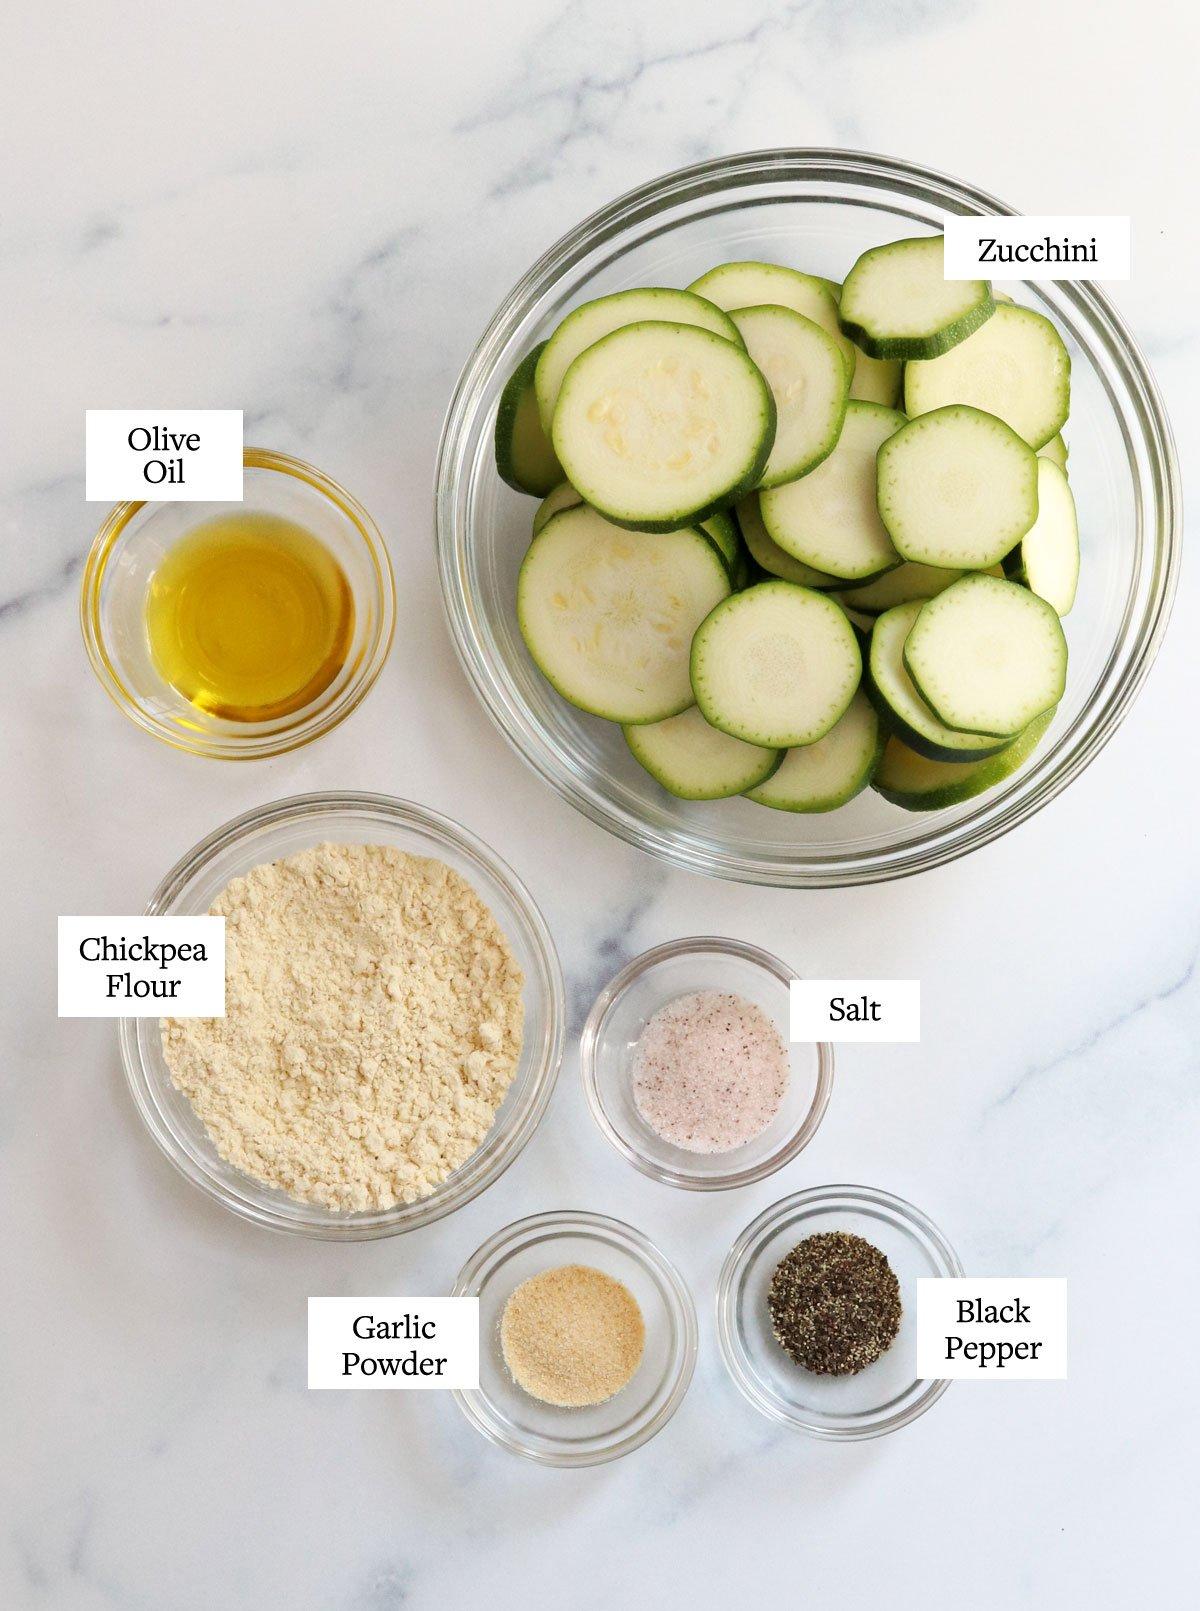 air fryer zucchini ingredients in glass bowls